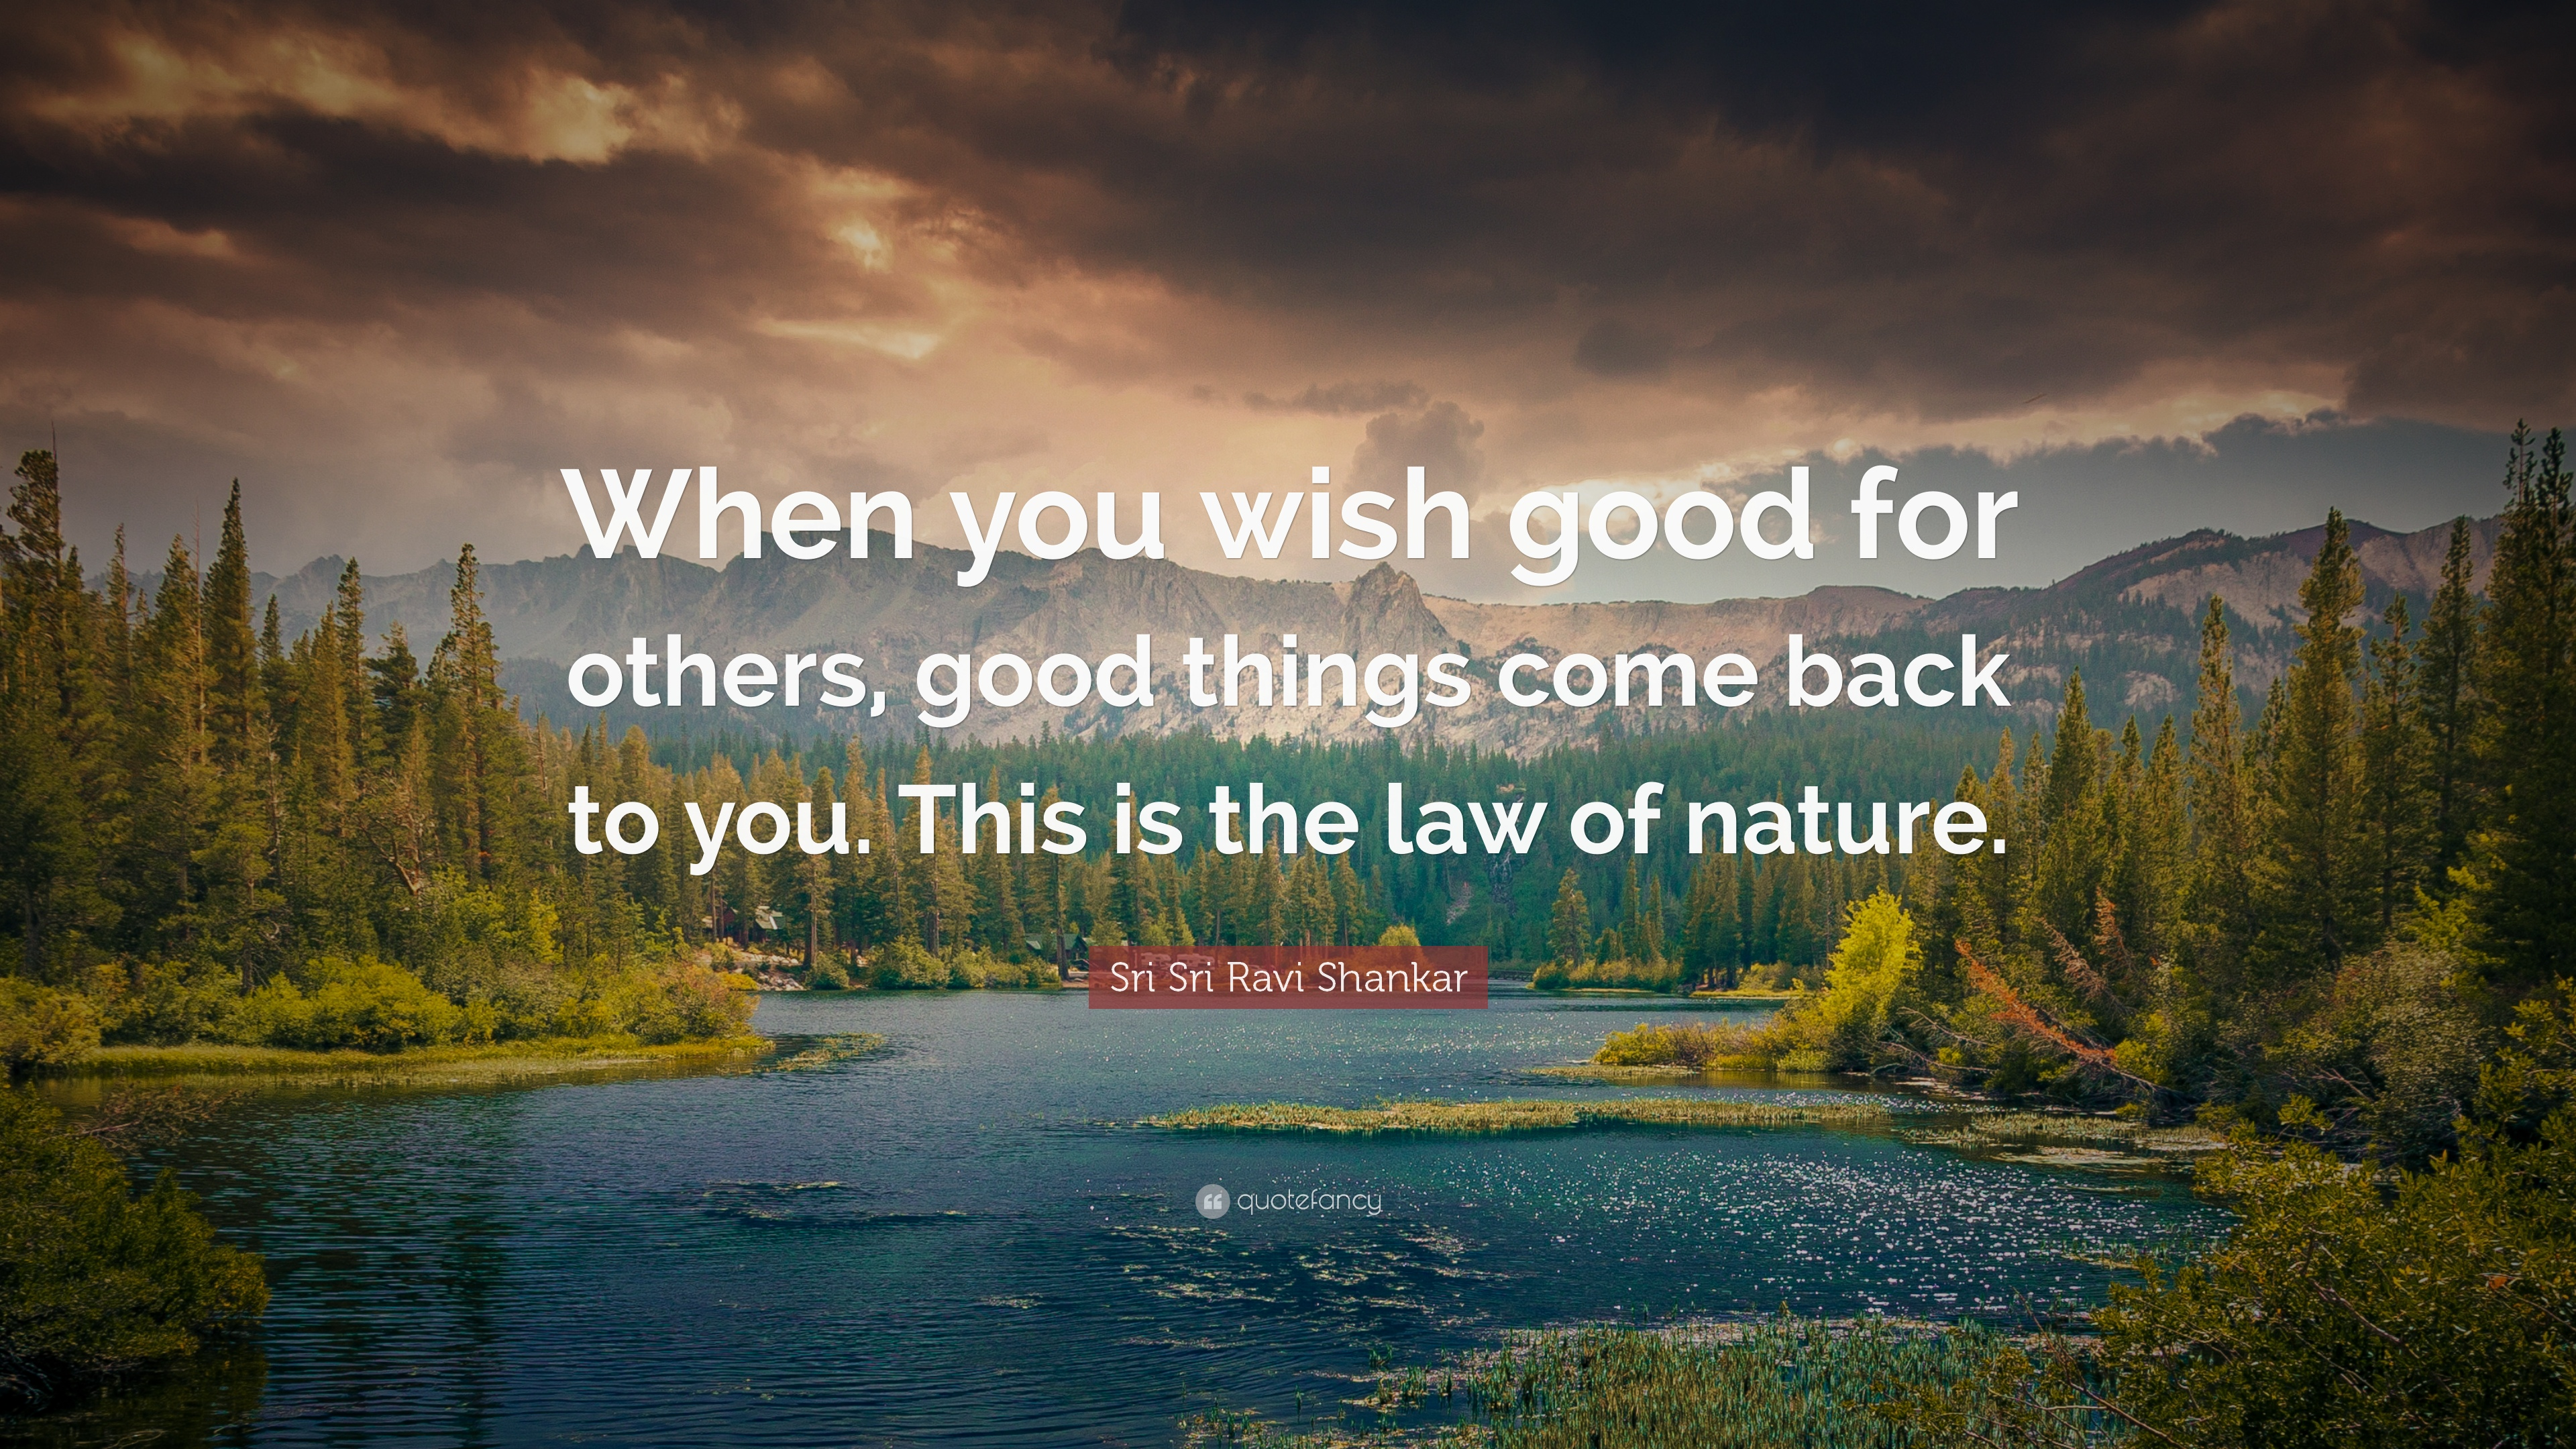 Sri Sri Ravi Shankar Quotes (100 wallpapers) - Quotefancy